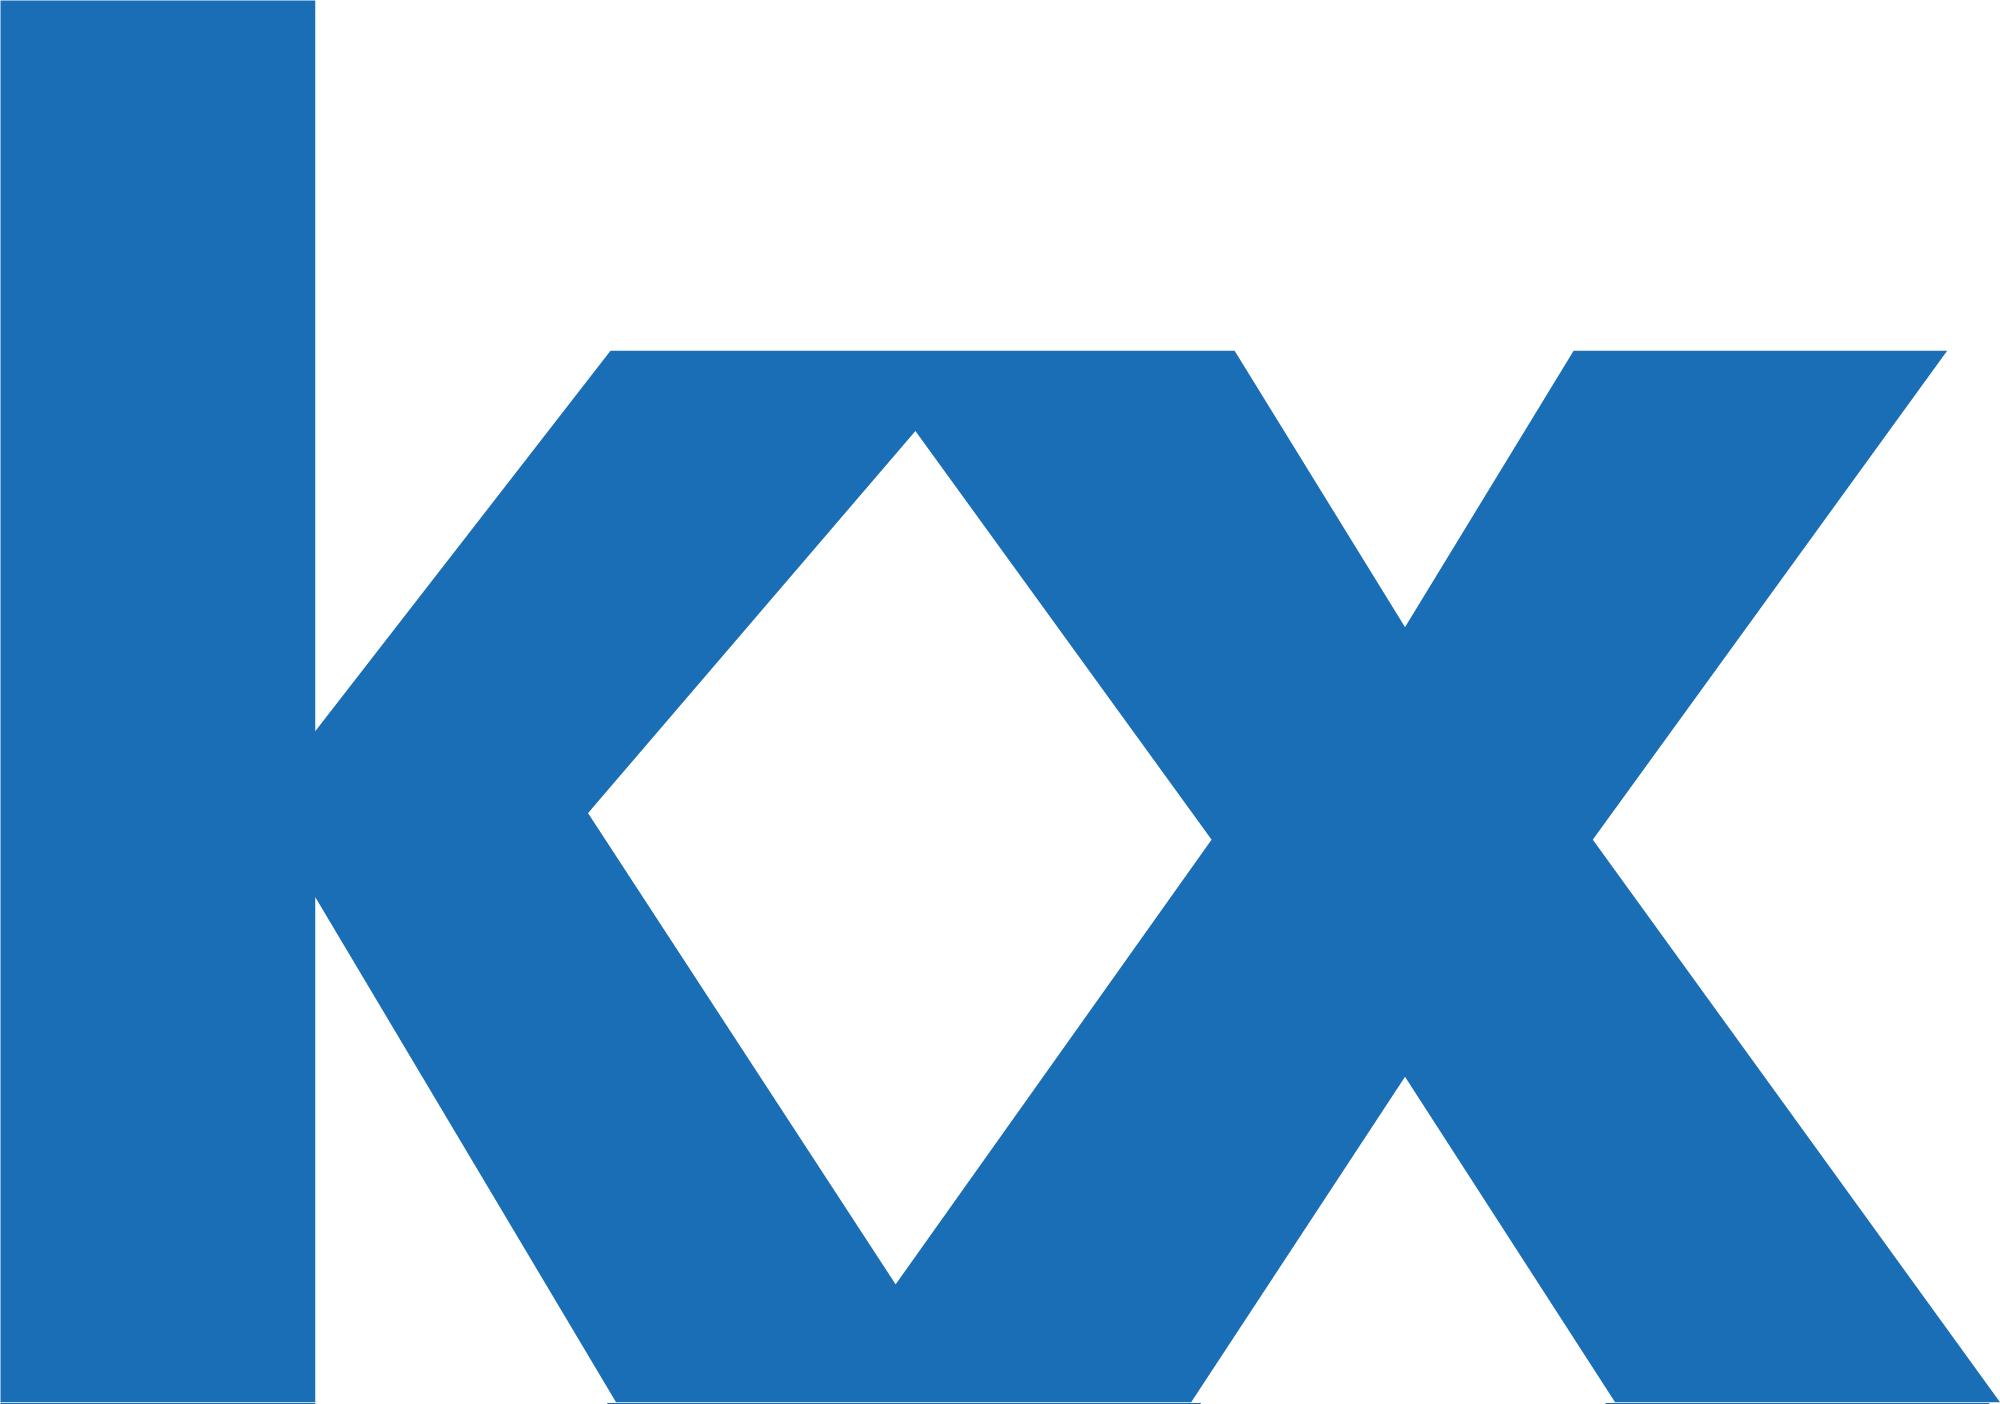 Kx is a partner in data